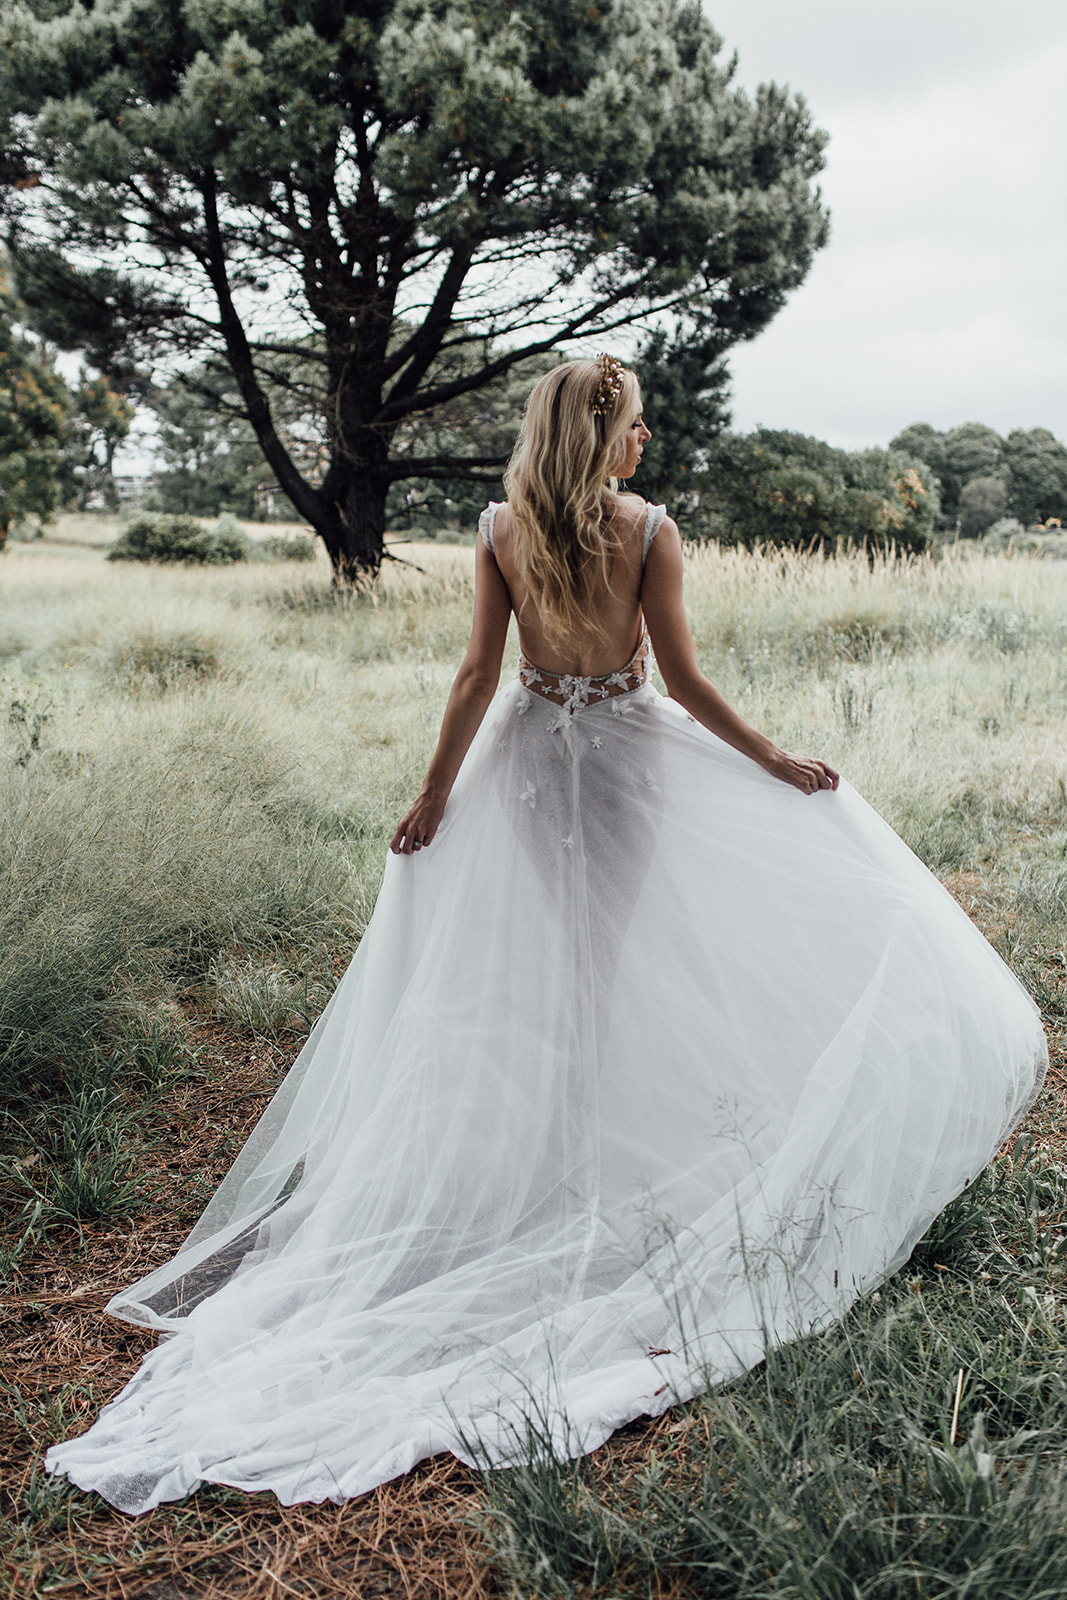 Ivonn-Couture-Eden-Couture-Collection-140.jpg